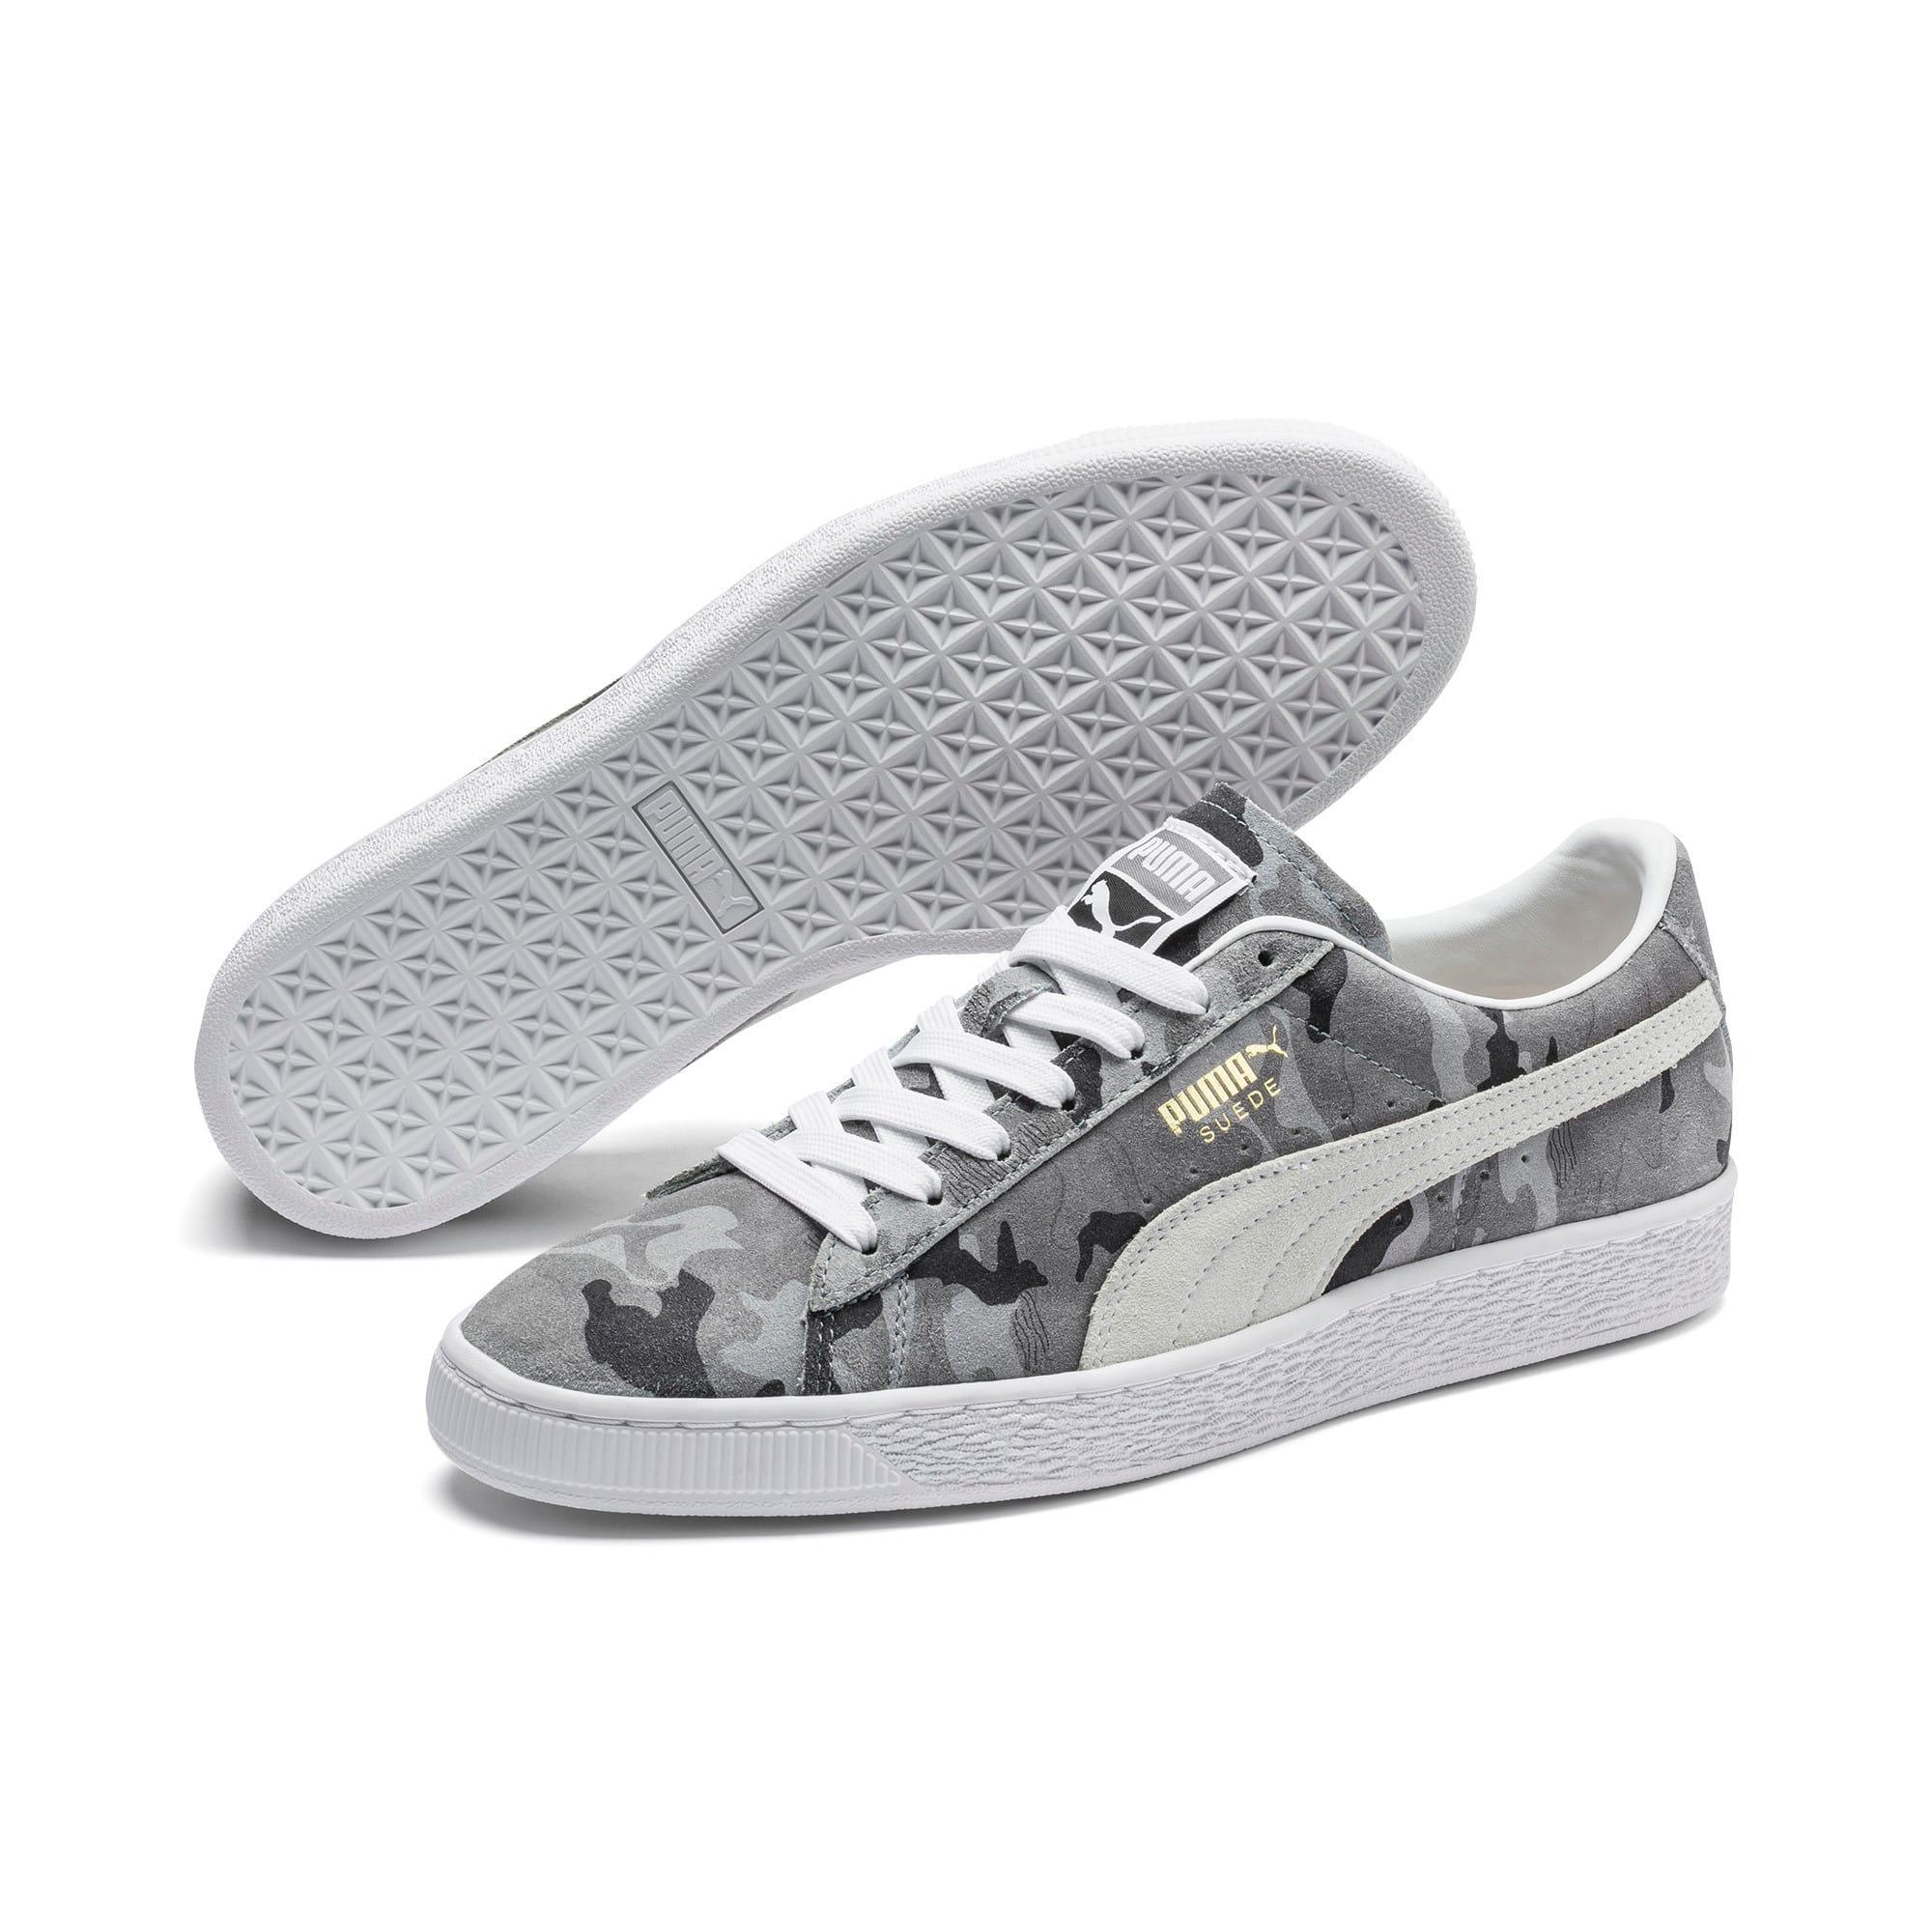 Thumbnail 2 of Suede Classic Ambush Sneakers, Puma Black-CASTLEROCK-White, medium